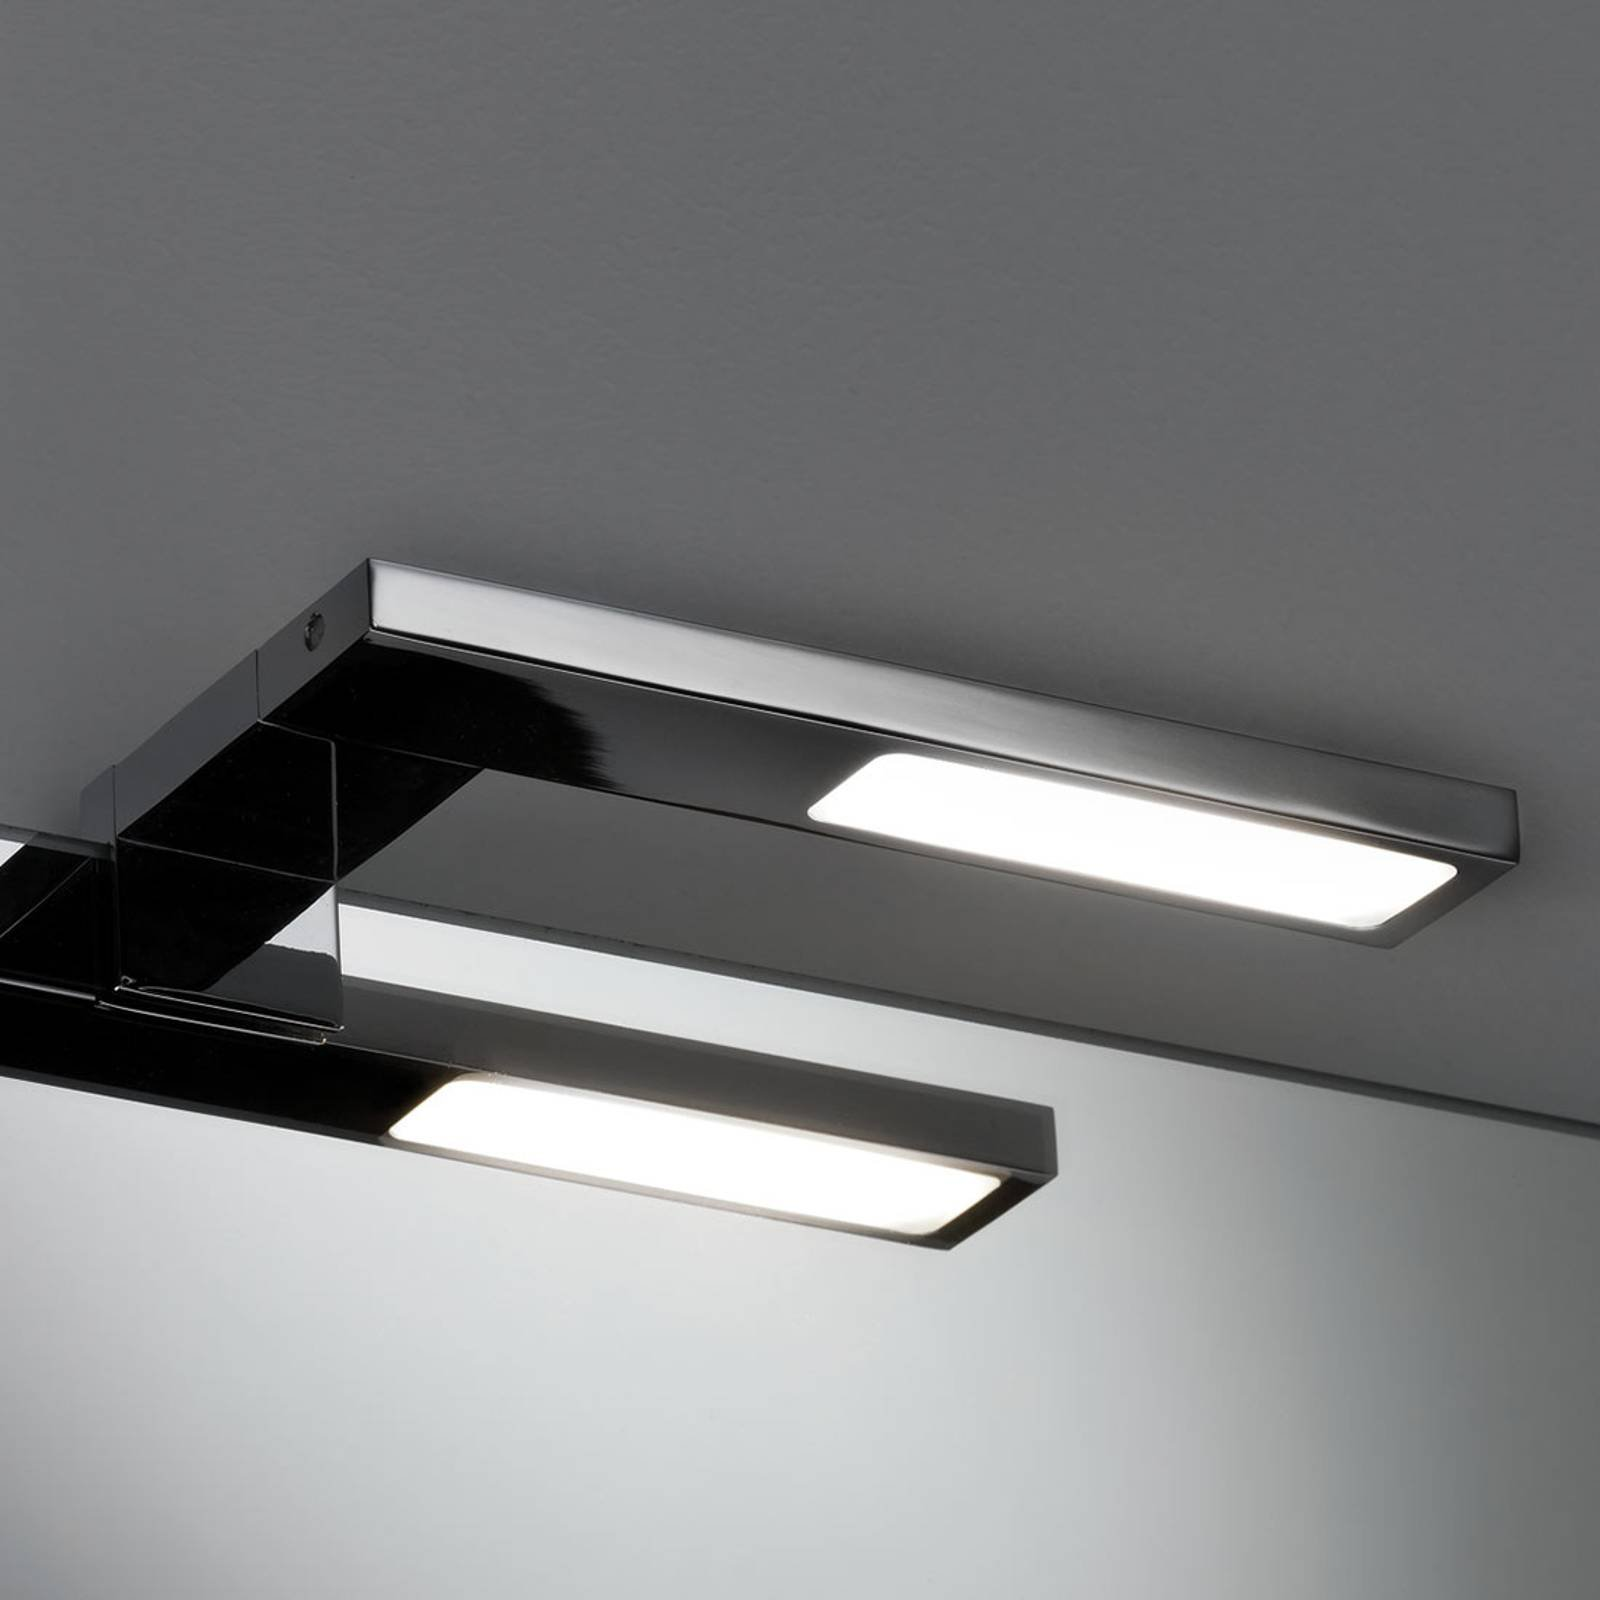 Paulmann Galeria Hook LED-speillampe, sidelengs